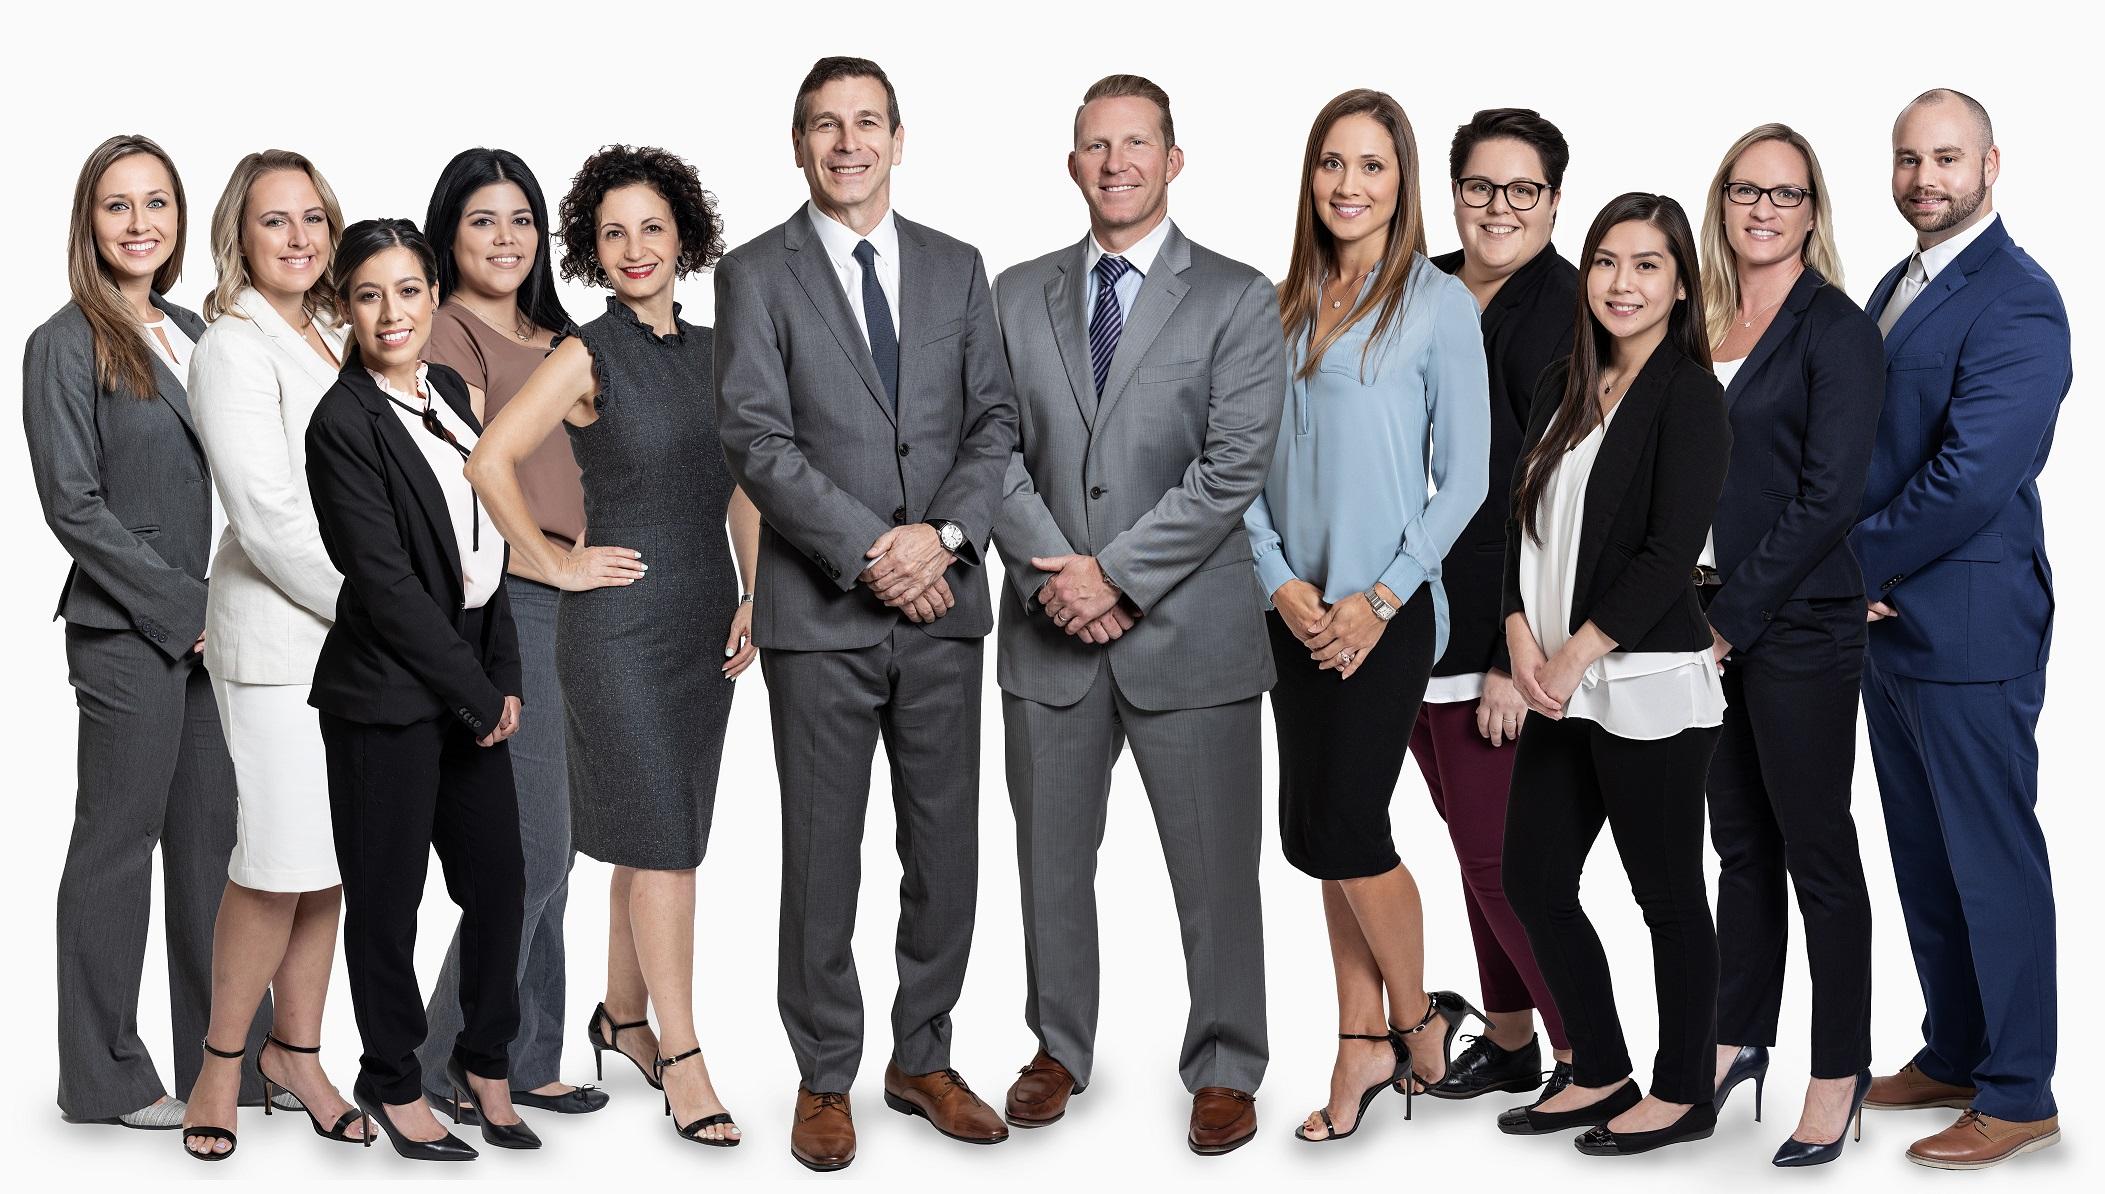 Pines Salomon Injury Lawyers, APC reviews | Personal Injury Law at 4660 La Jolla Village Dr - San Diego CA